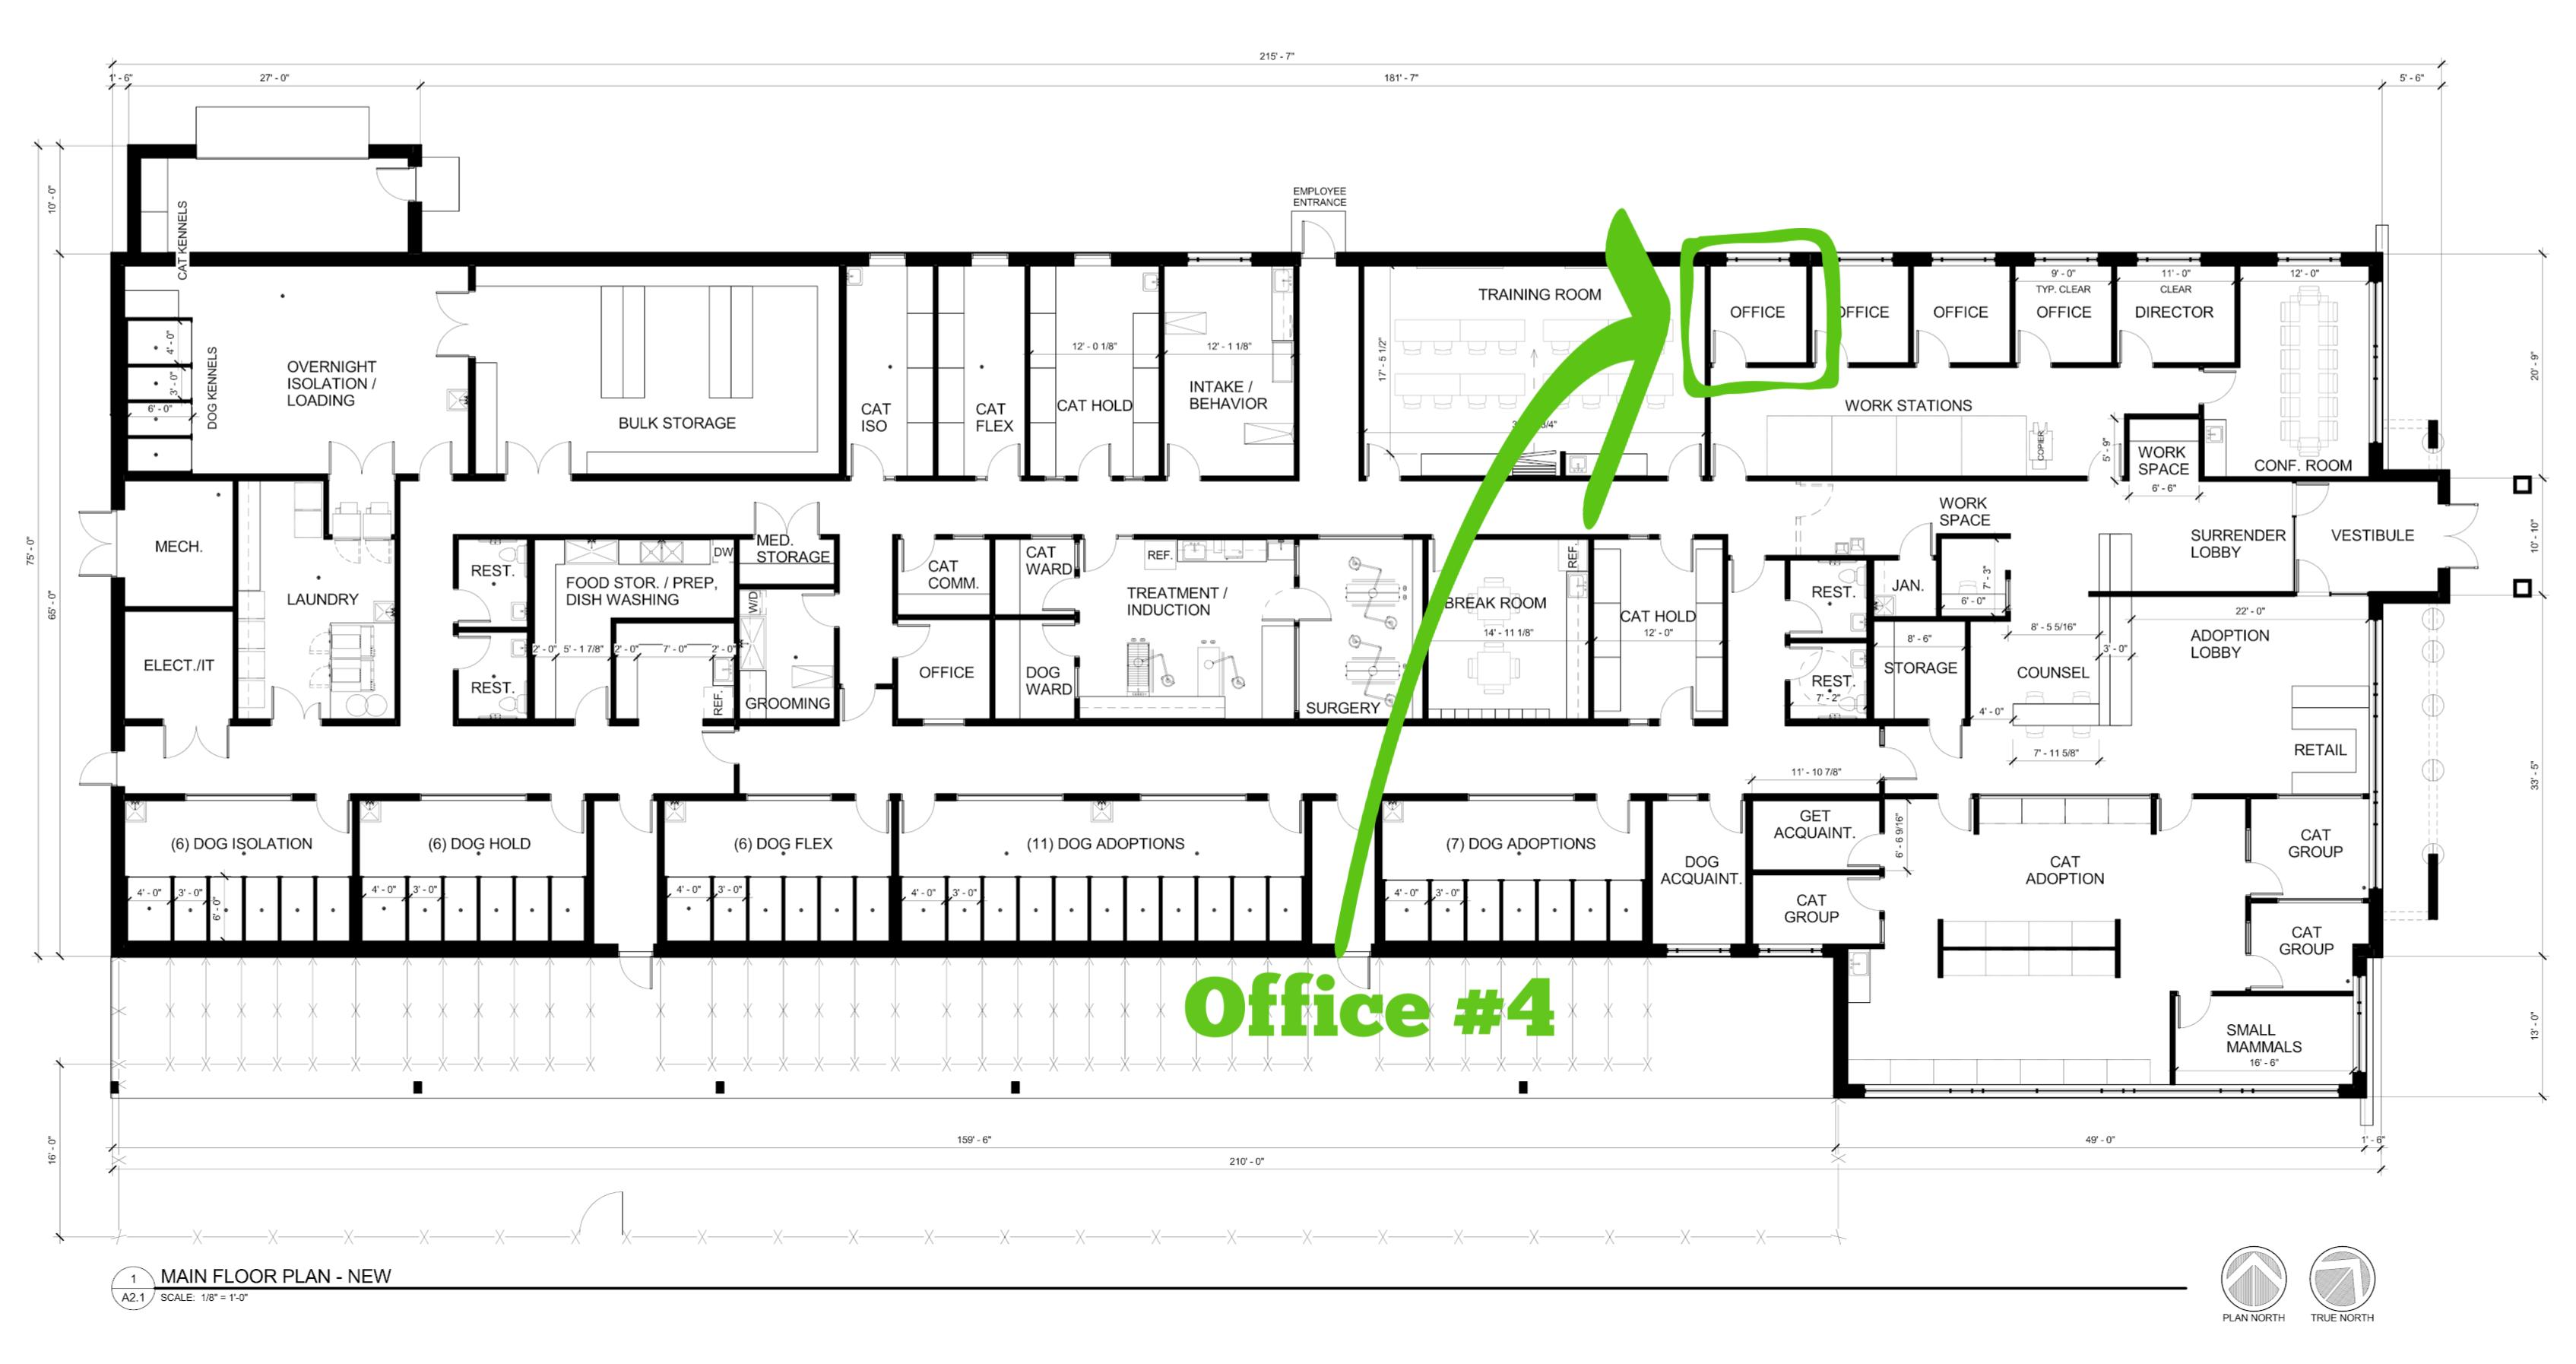 Office #4